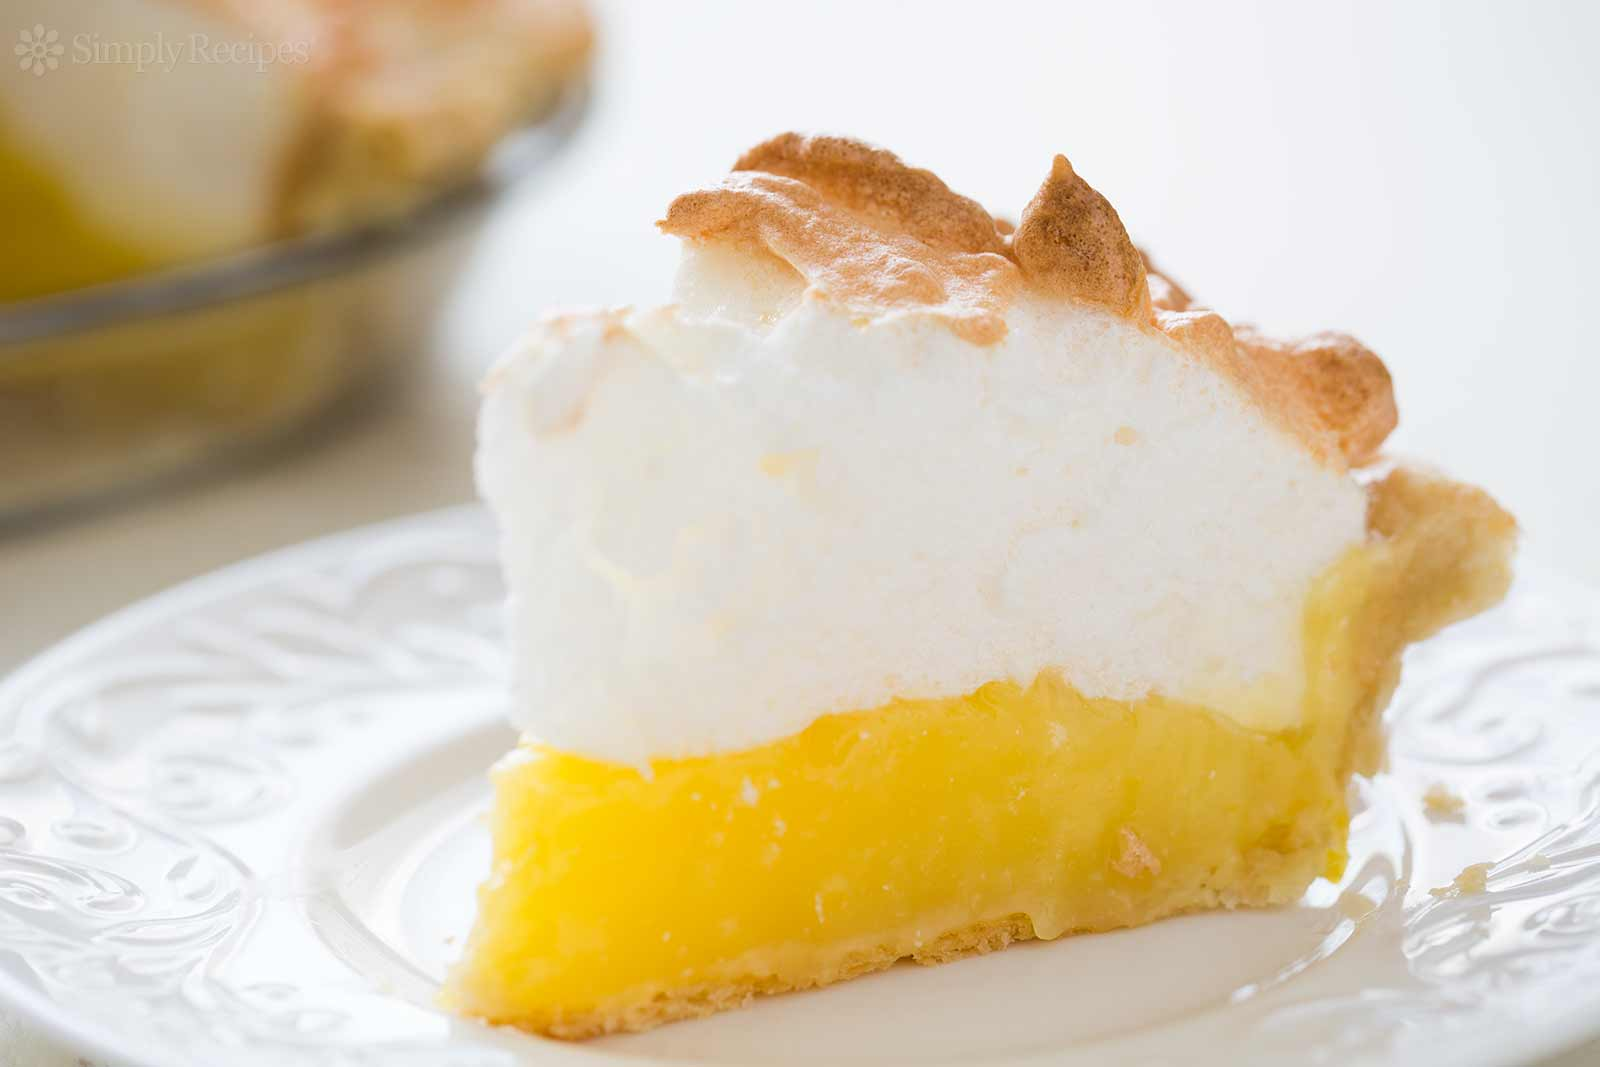 lemon-meringue-pie-horiz-b-1600